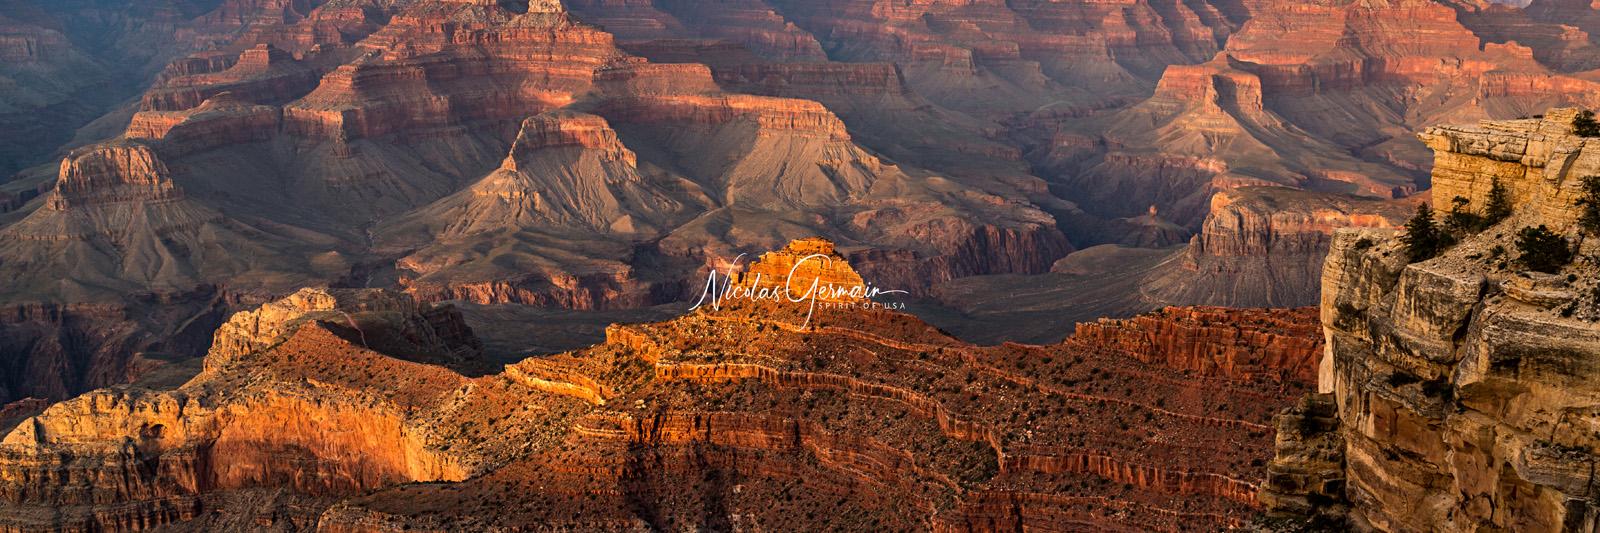 Grand Canyon, Mather Point - Nicolas Germain, Spirit of USA